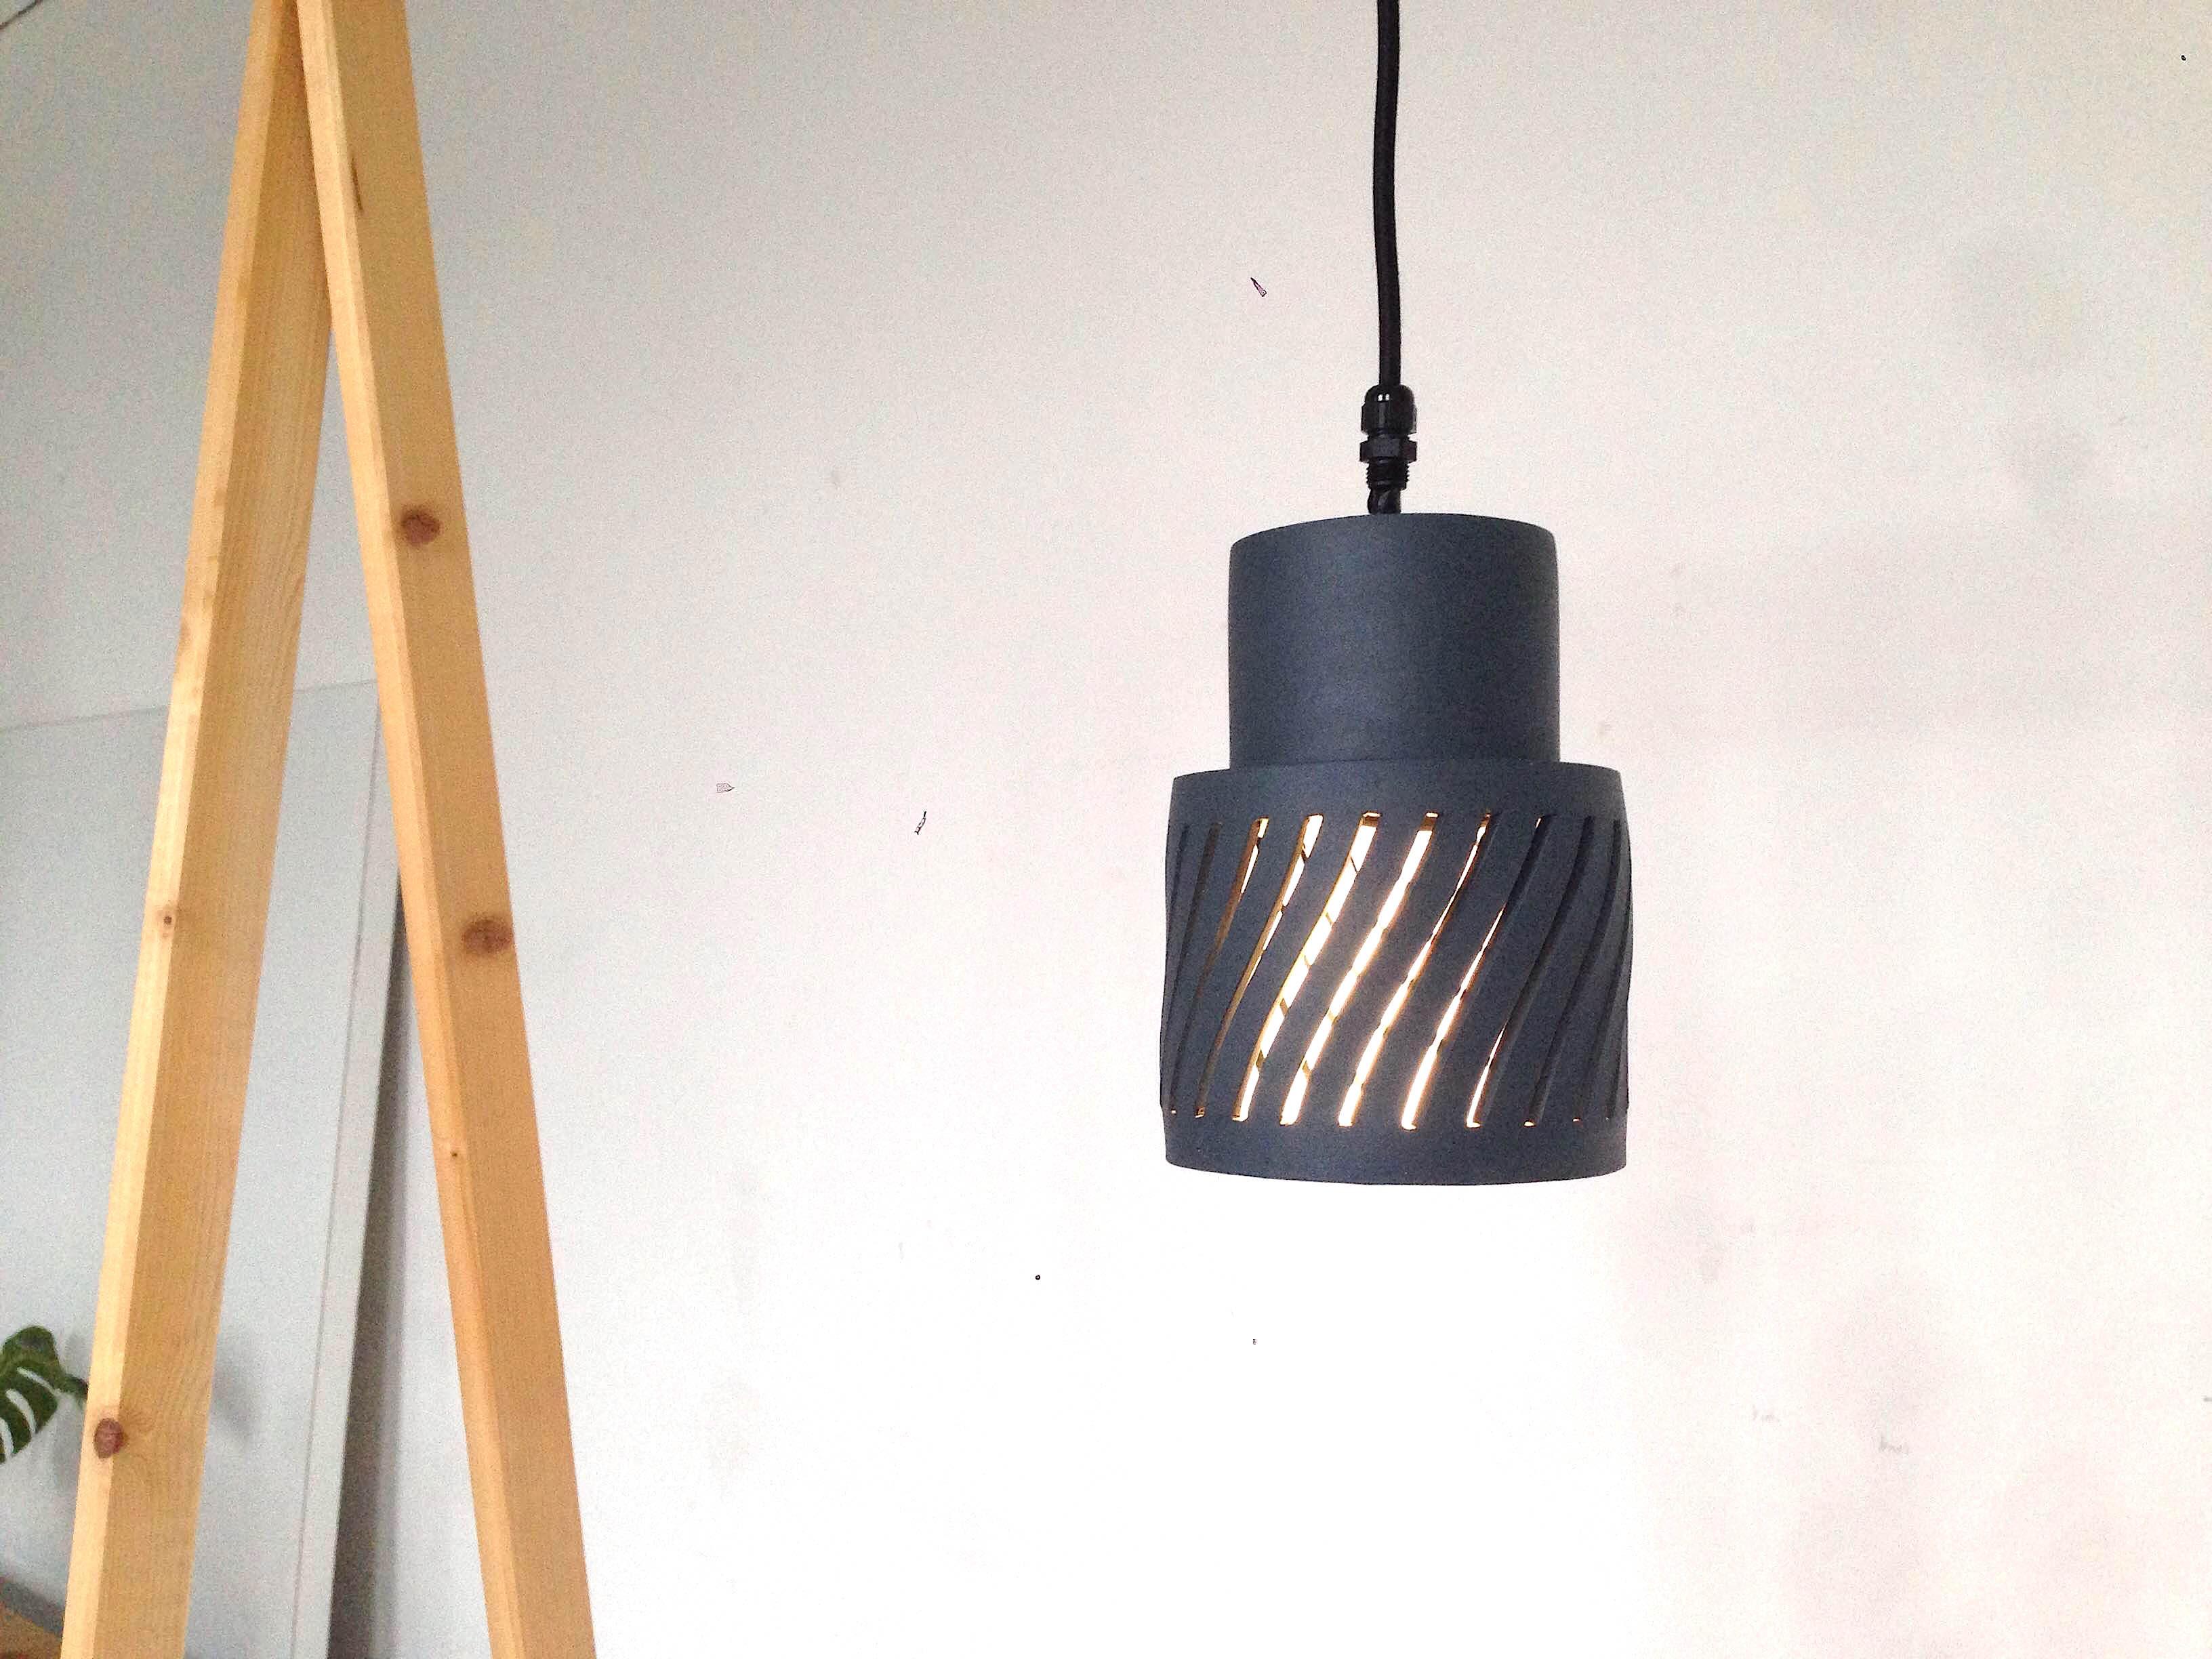 lab lamps series high gs lamp foreverlamp retrofit bay led